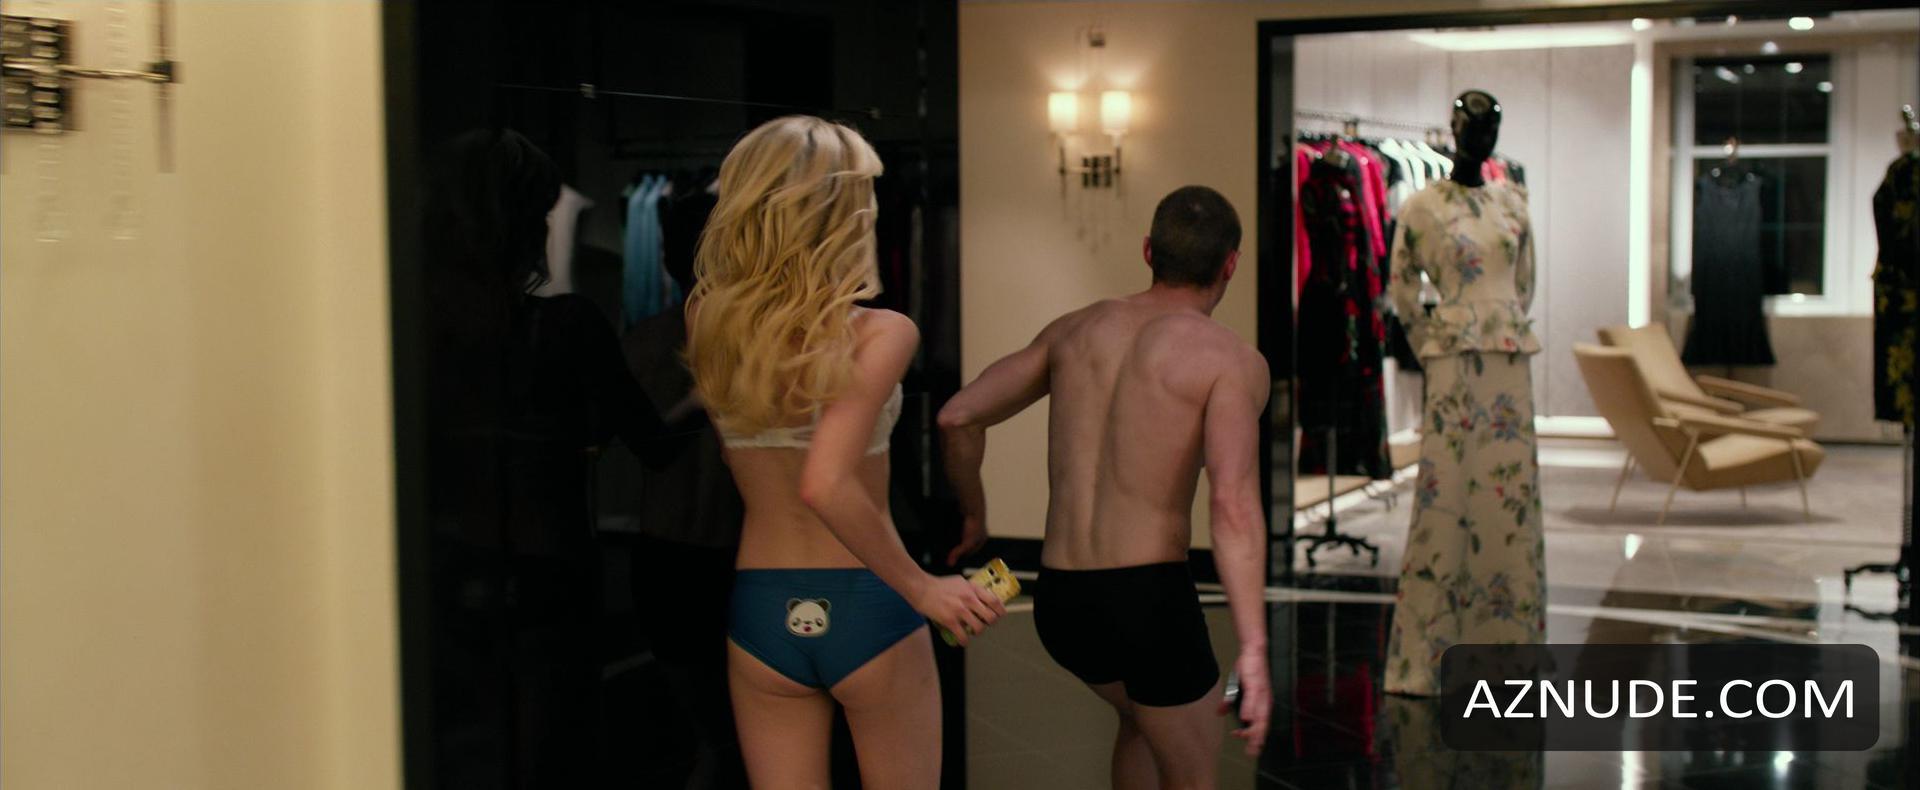 Riley roberts pornstar